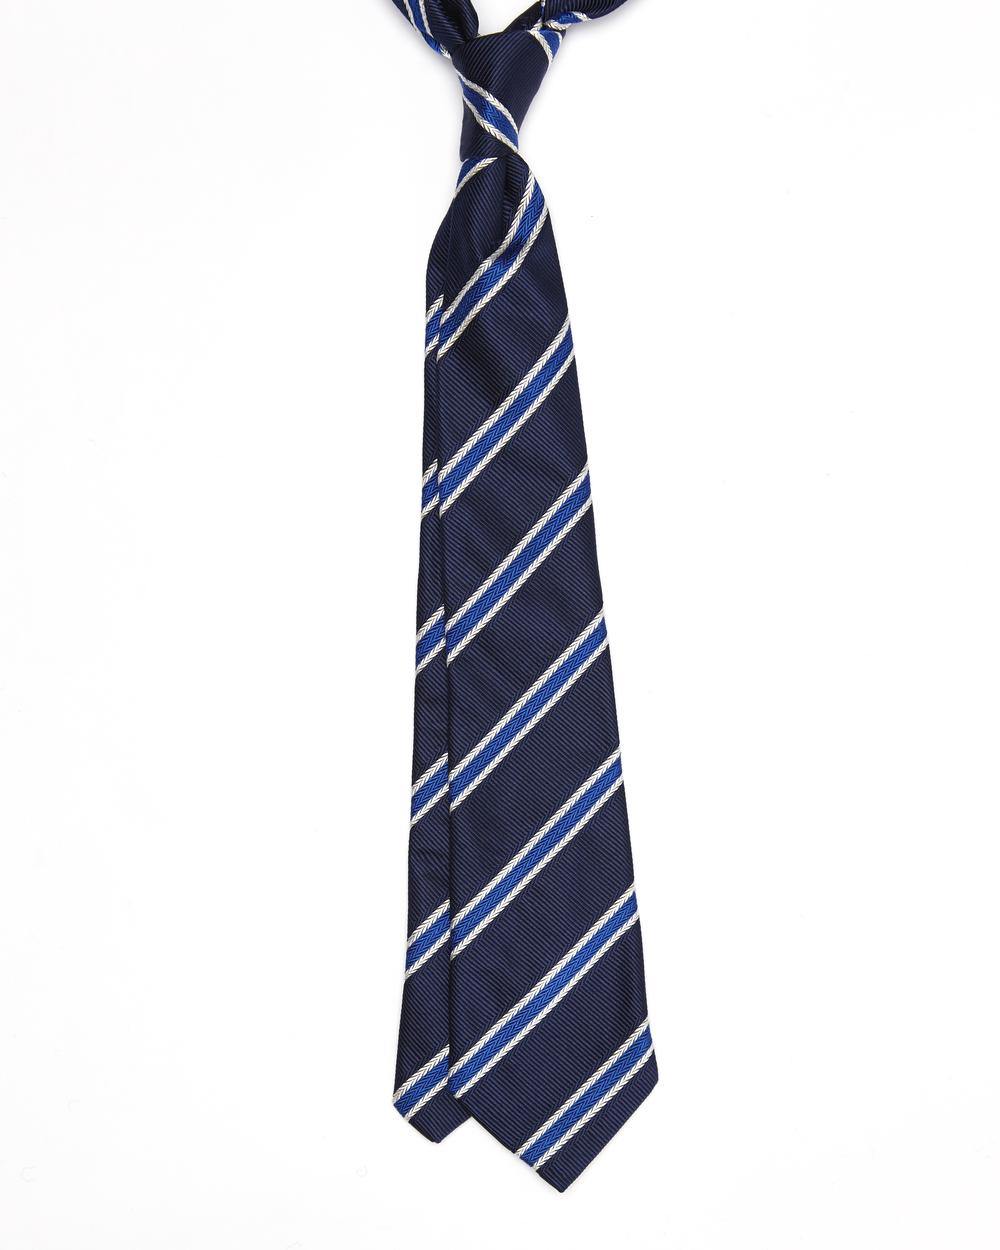 Elroy Tie |100% Silk Jacquard Herringbone Stripe | Colour: Navy, Colbolt Blue & White